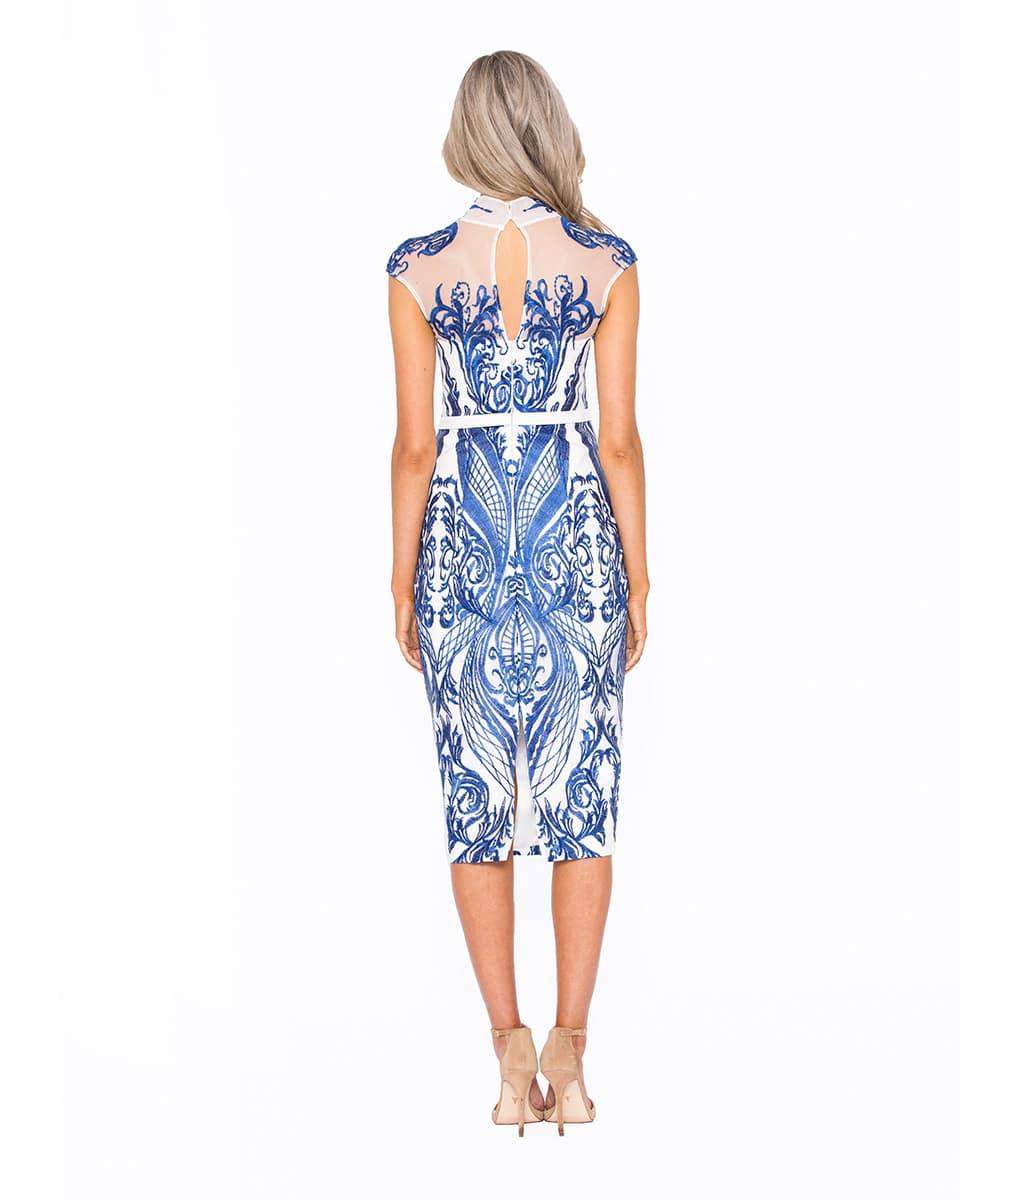 Alila-White-and-Cobalt-Tailored-Midi-Dress-Bariano